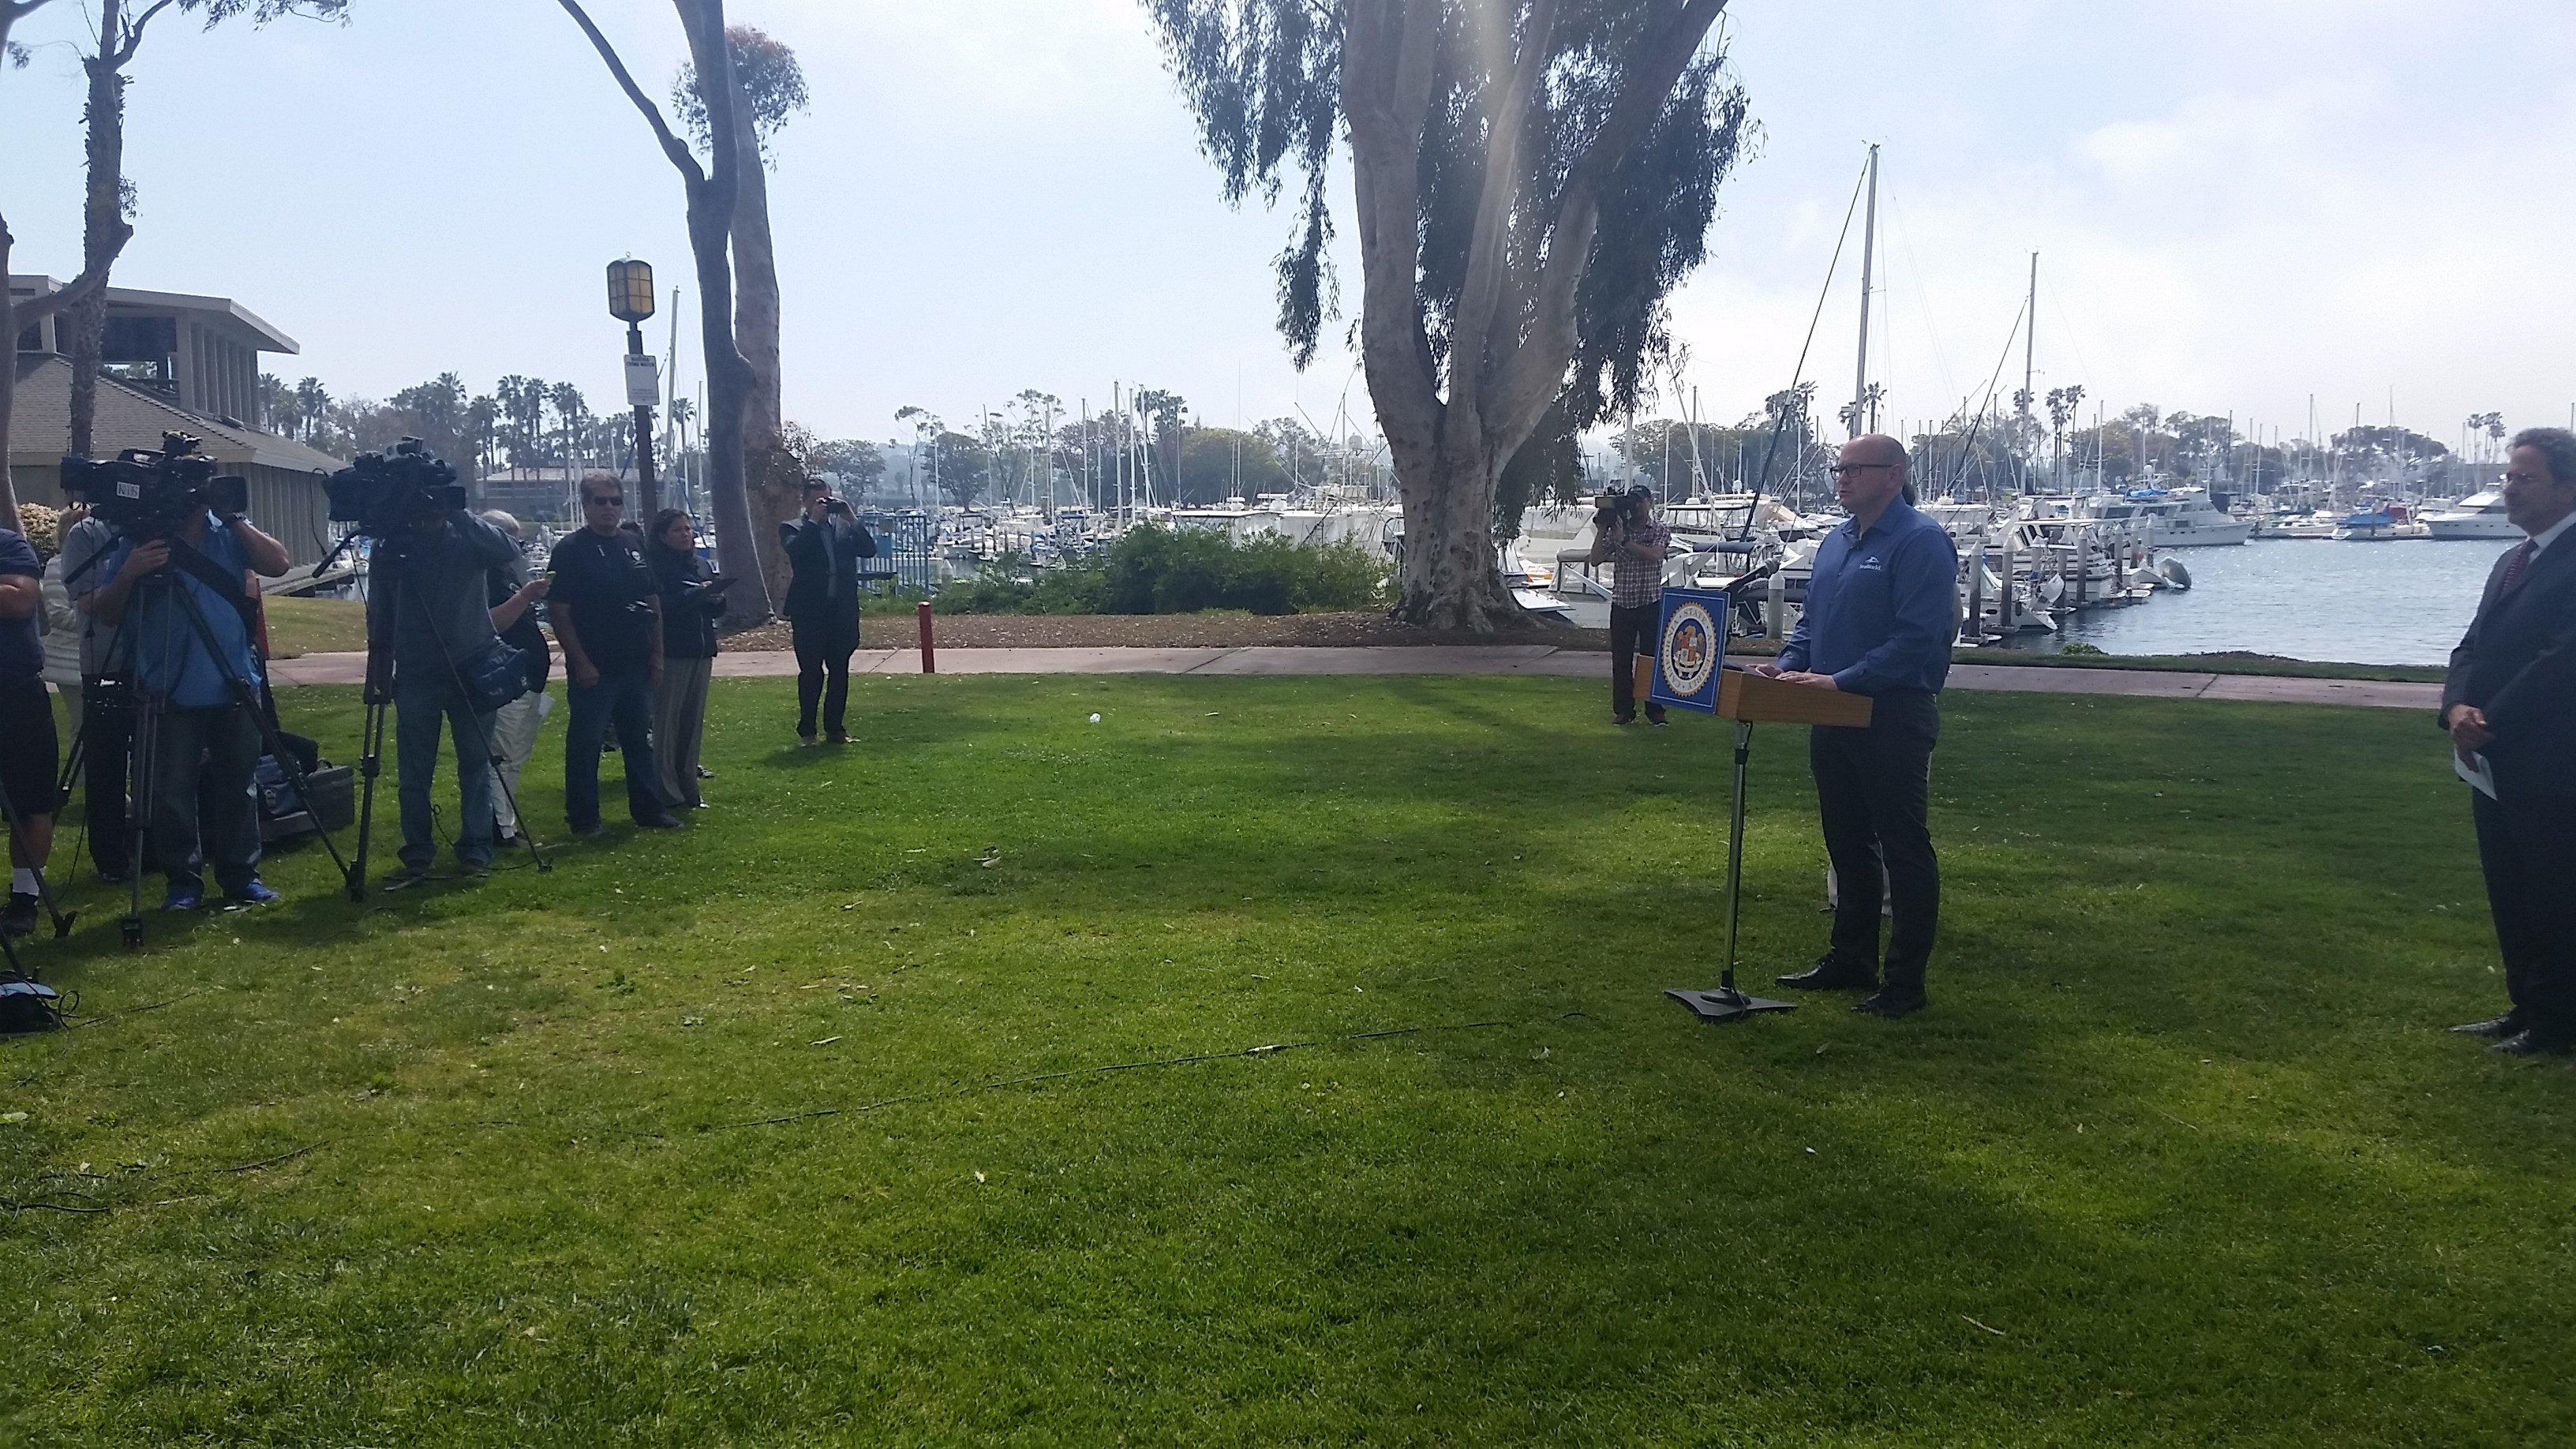 John T. Reilly, SeaWorld San Diego President